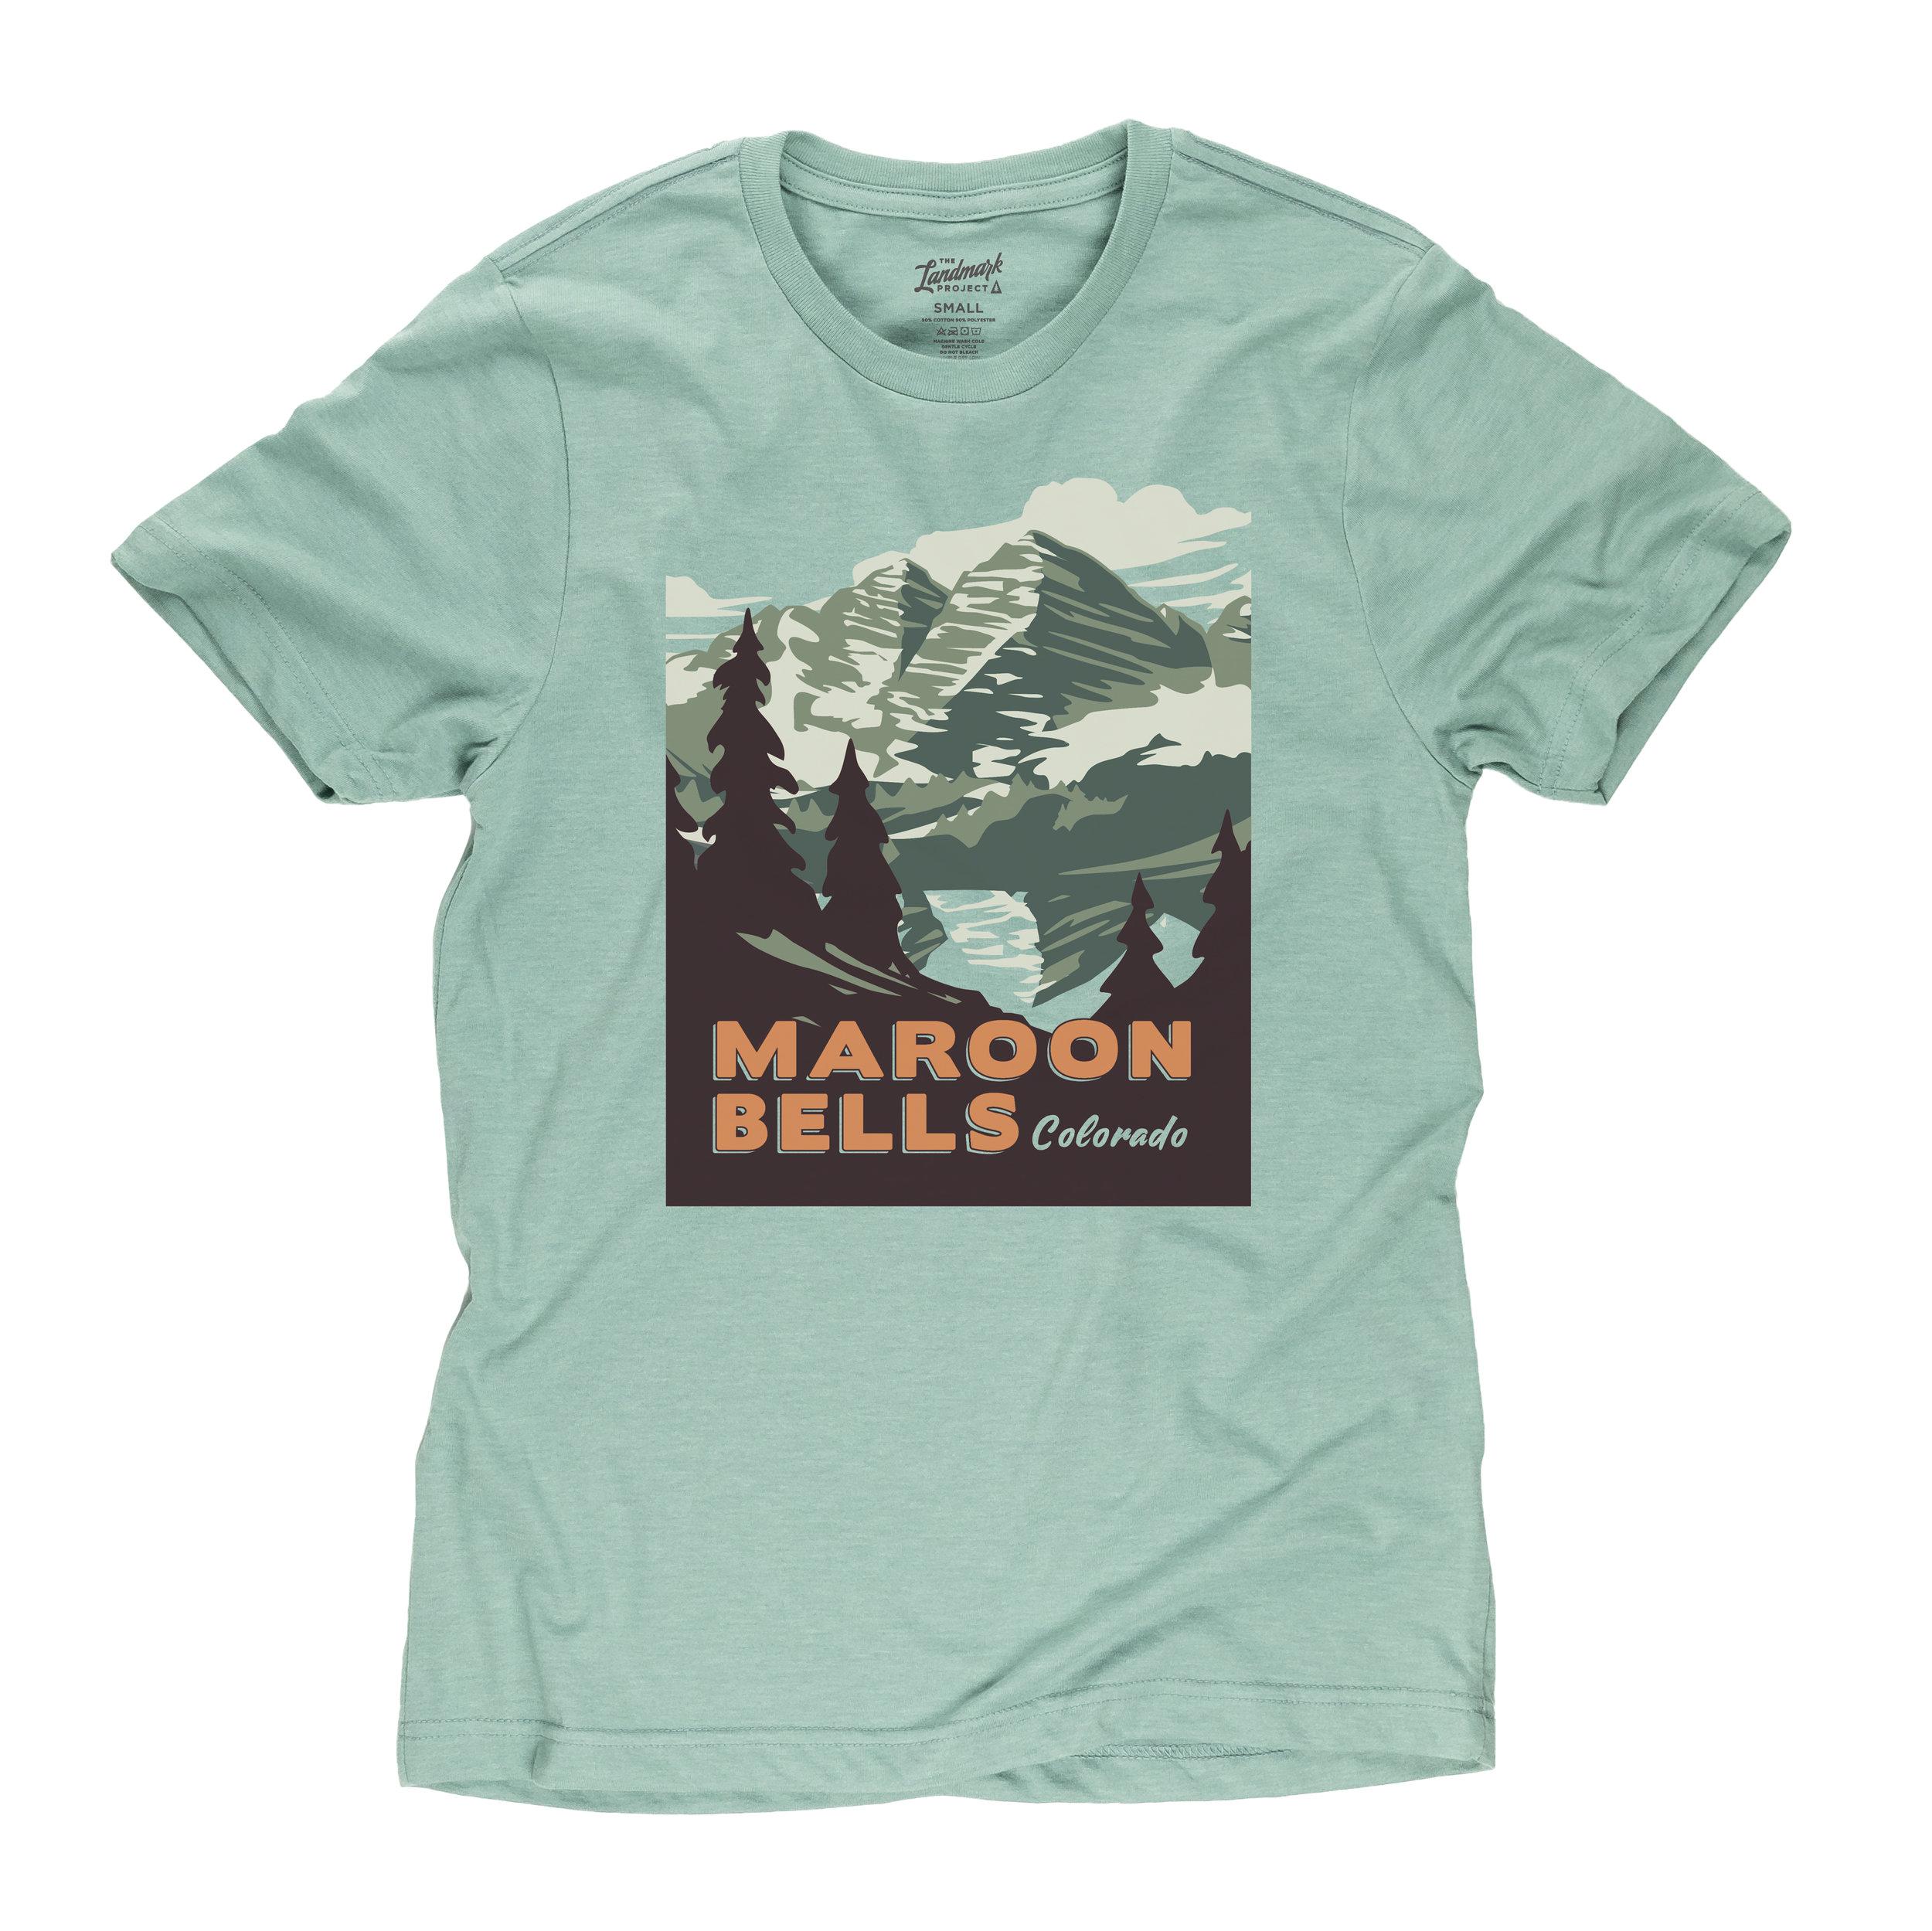 maroon-bells-shirt-seafoam.jpg